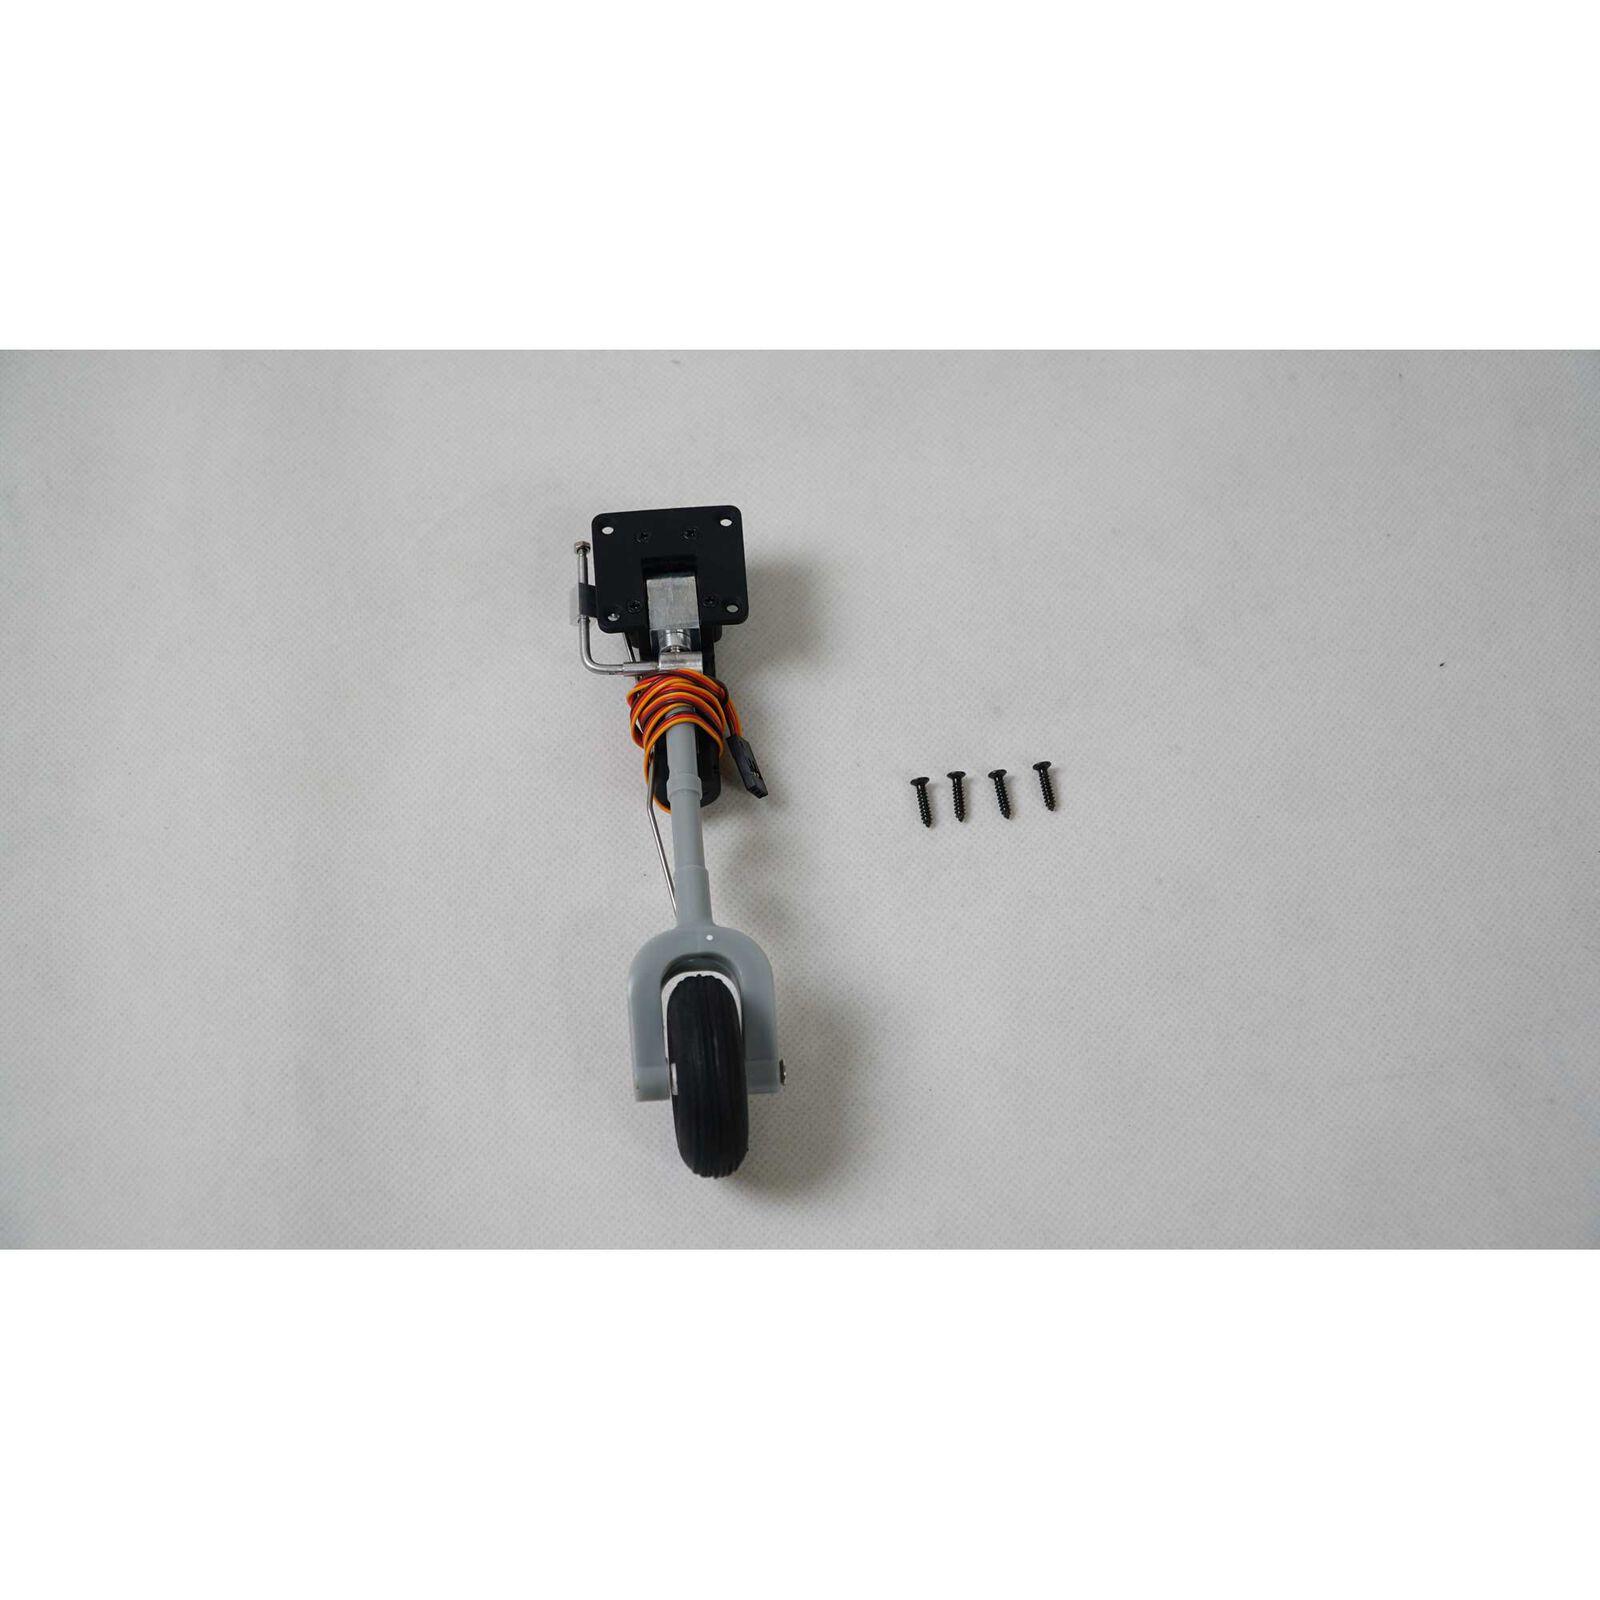 Front Landing Gear System: CJ-6 V2